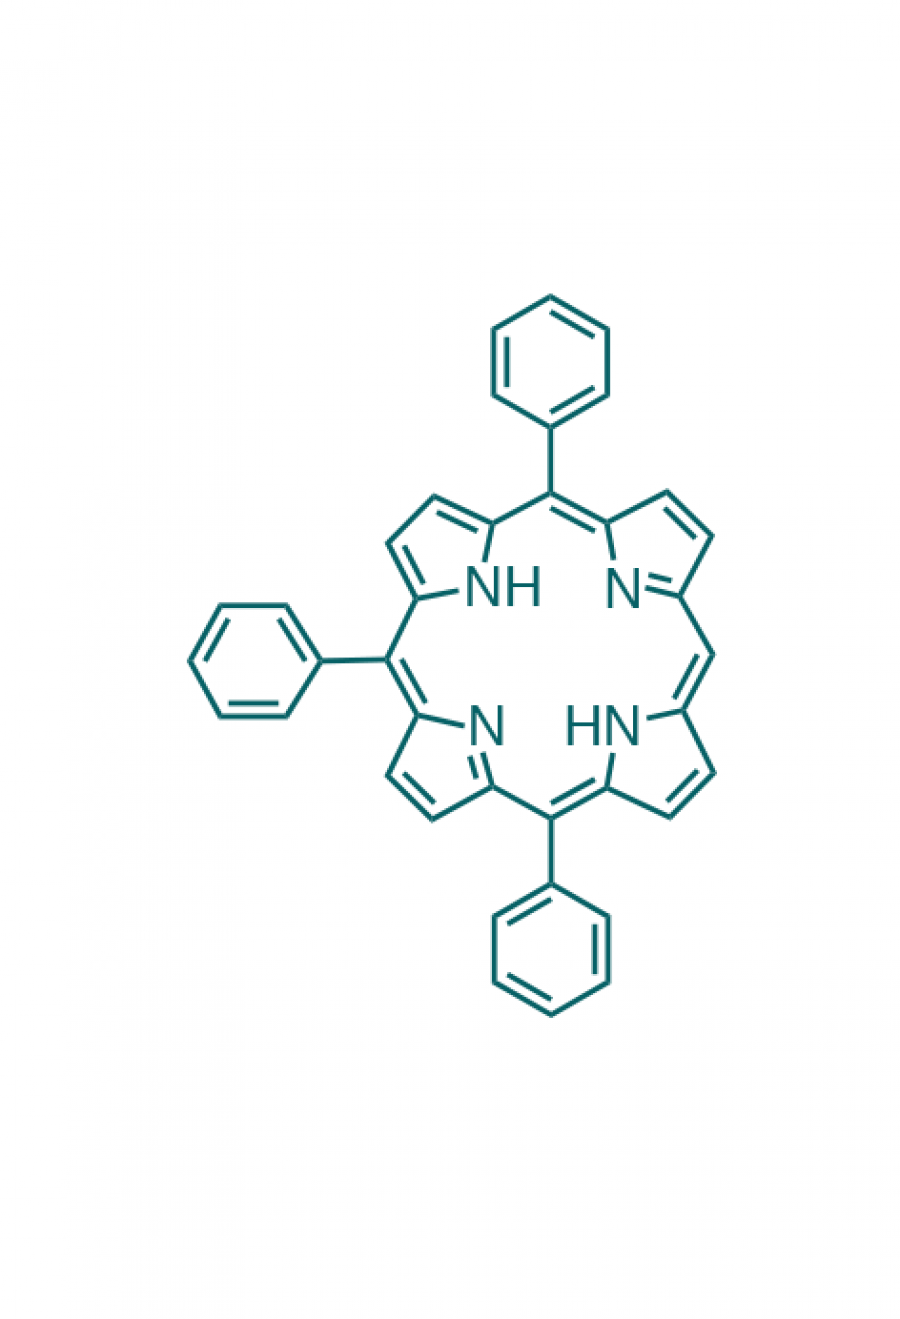 5,10,15-(triphenyl)porphyrin